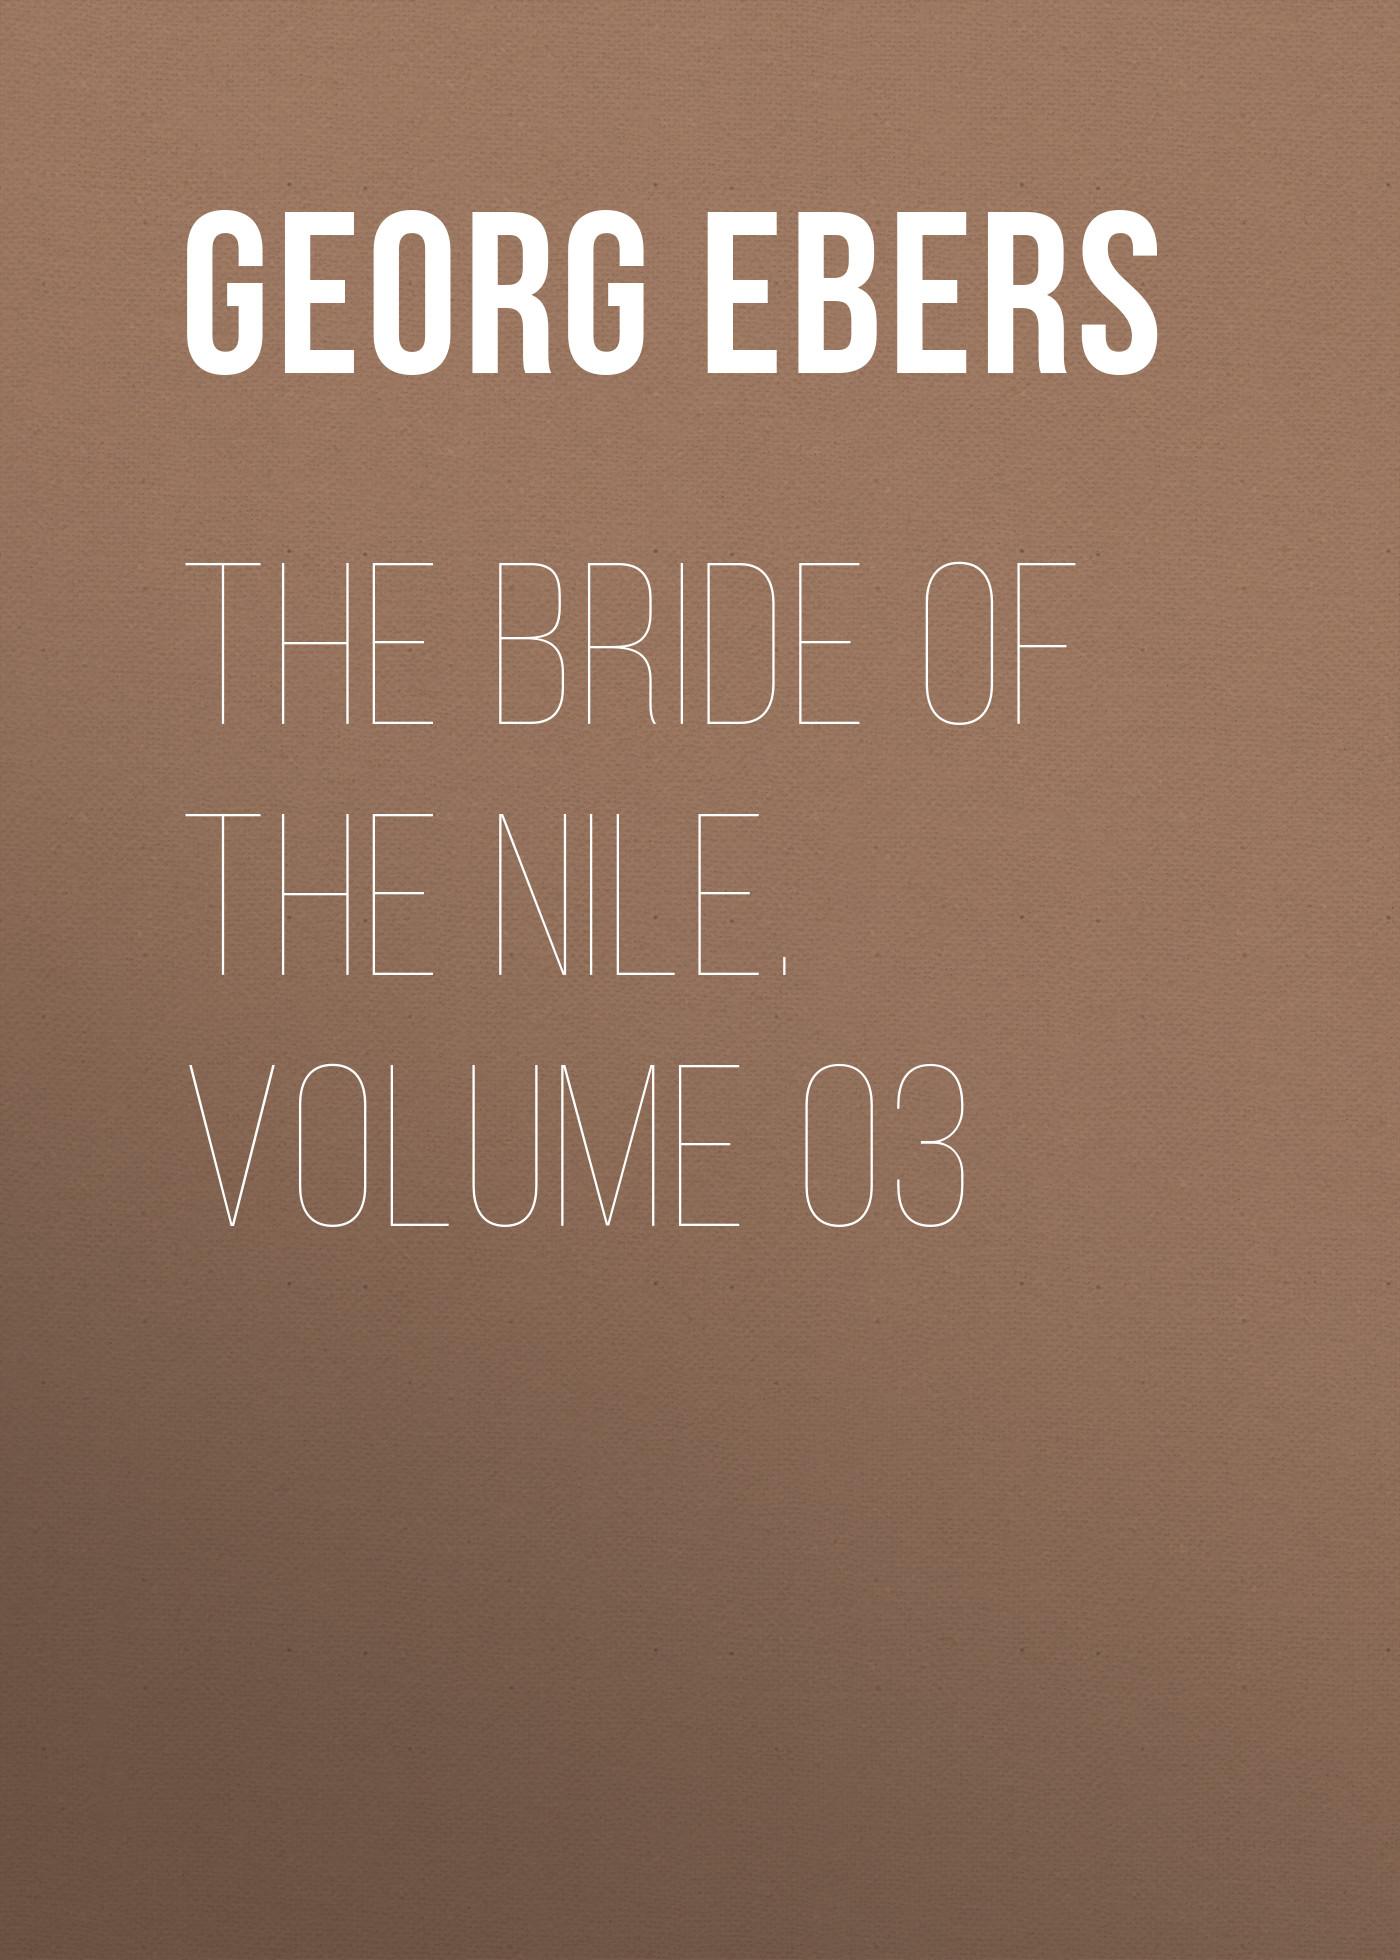 Georg Ebers The Bride of the Nile. Volume 03 gervinus georg gottfried the art of drinking